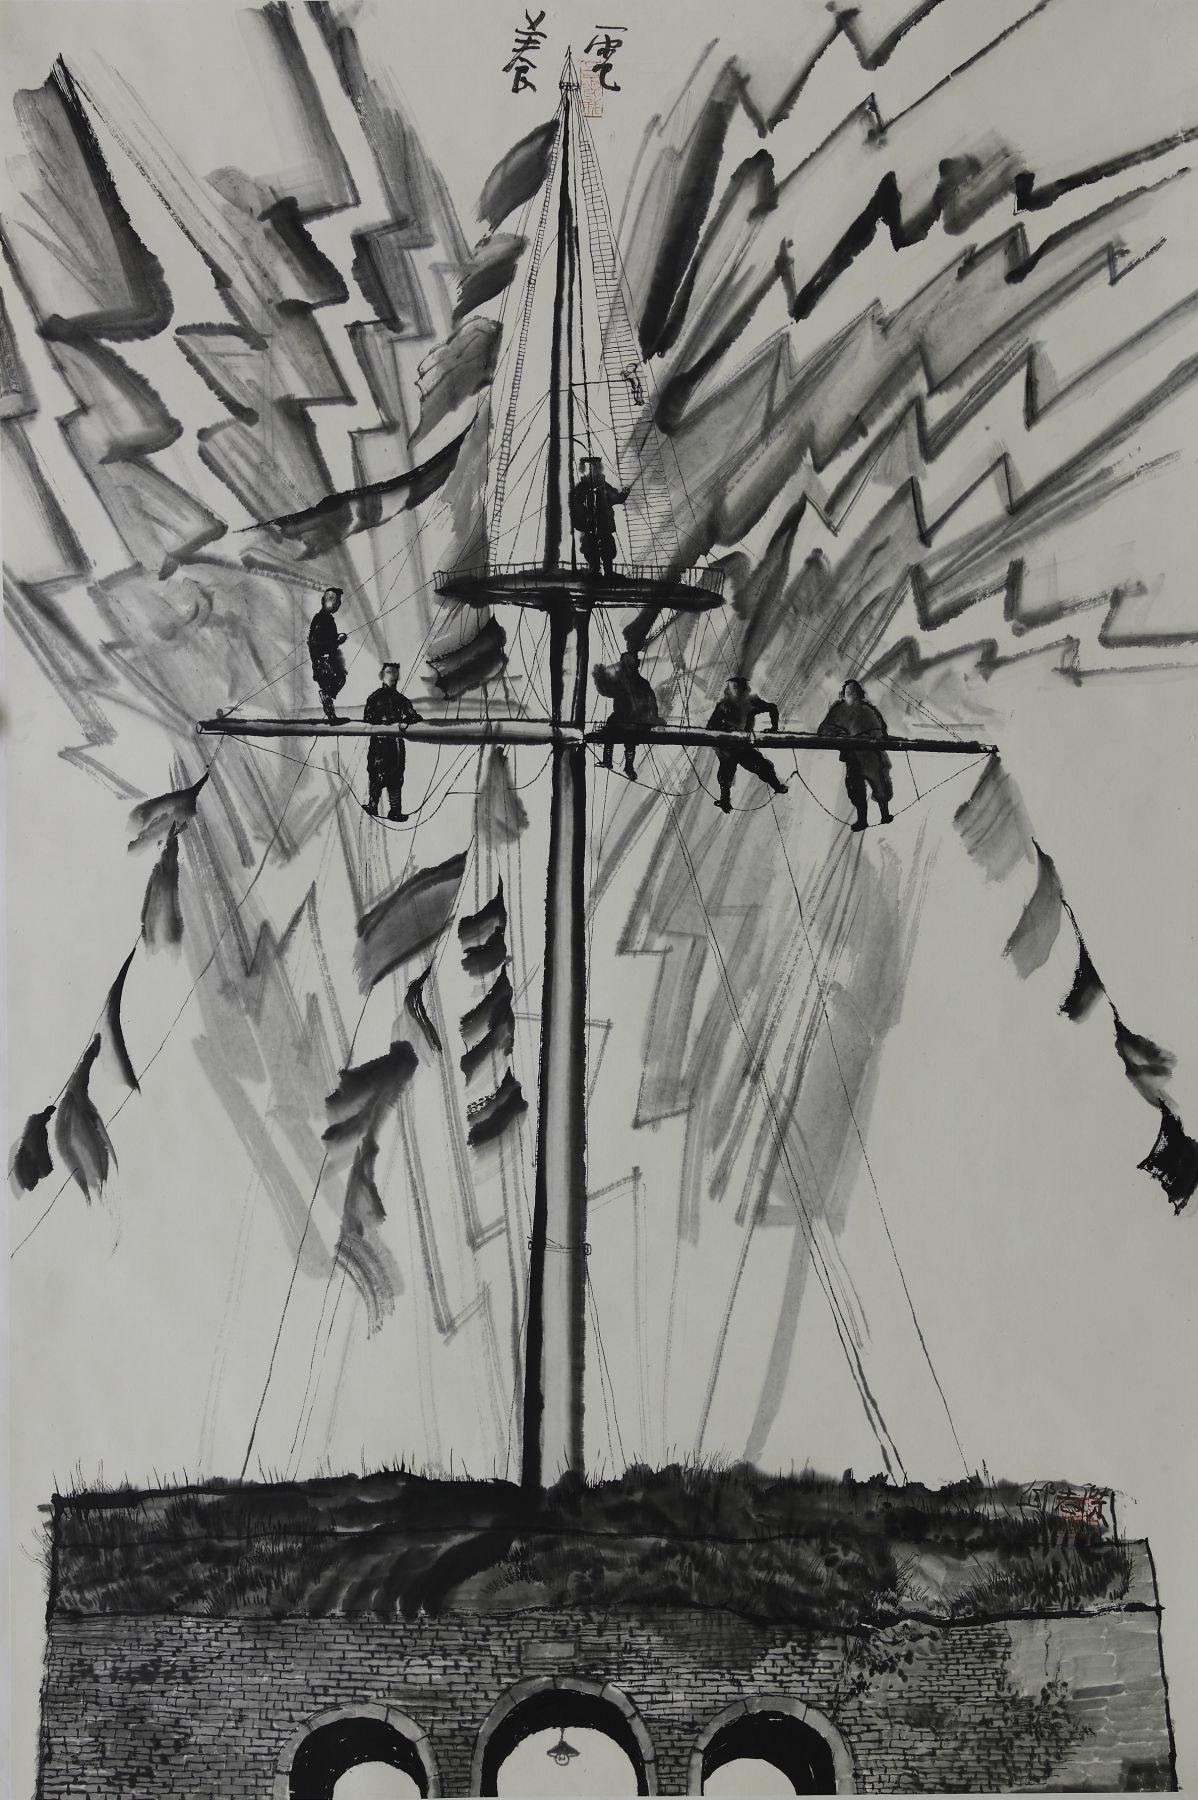 Qiu Zhijie 邱志杰 (b.1969), Lightening Breeding 养电